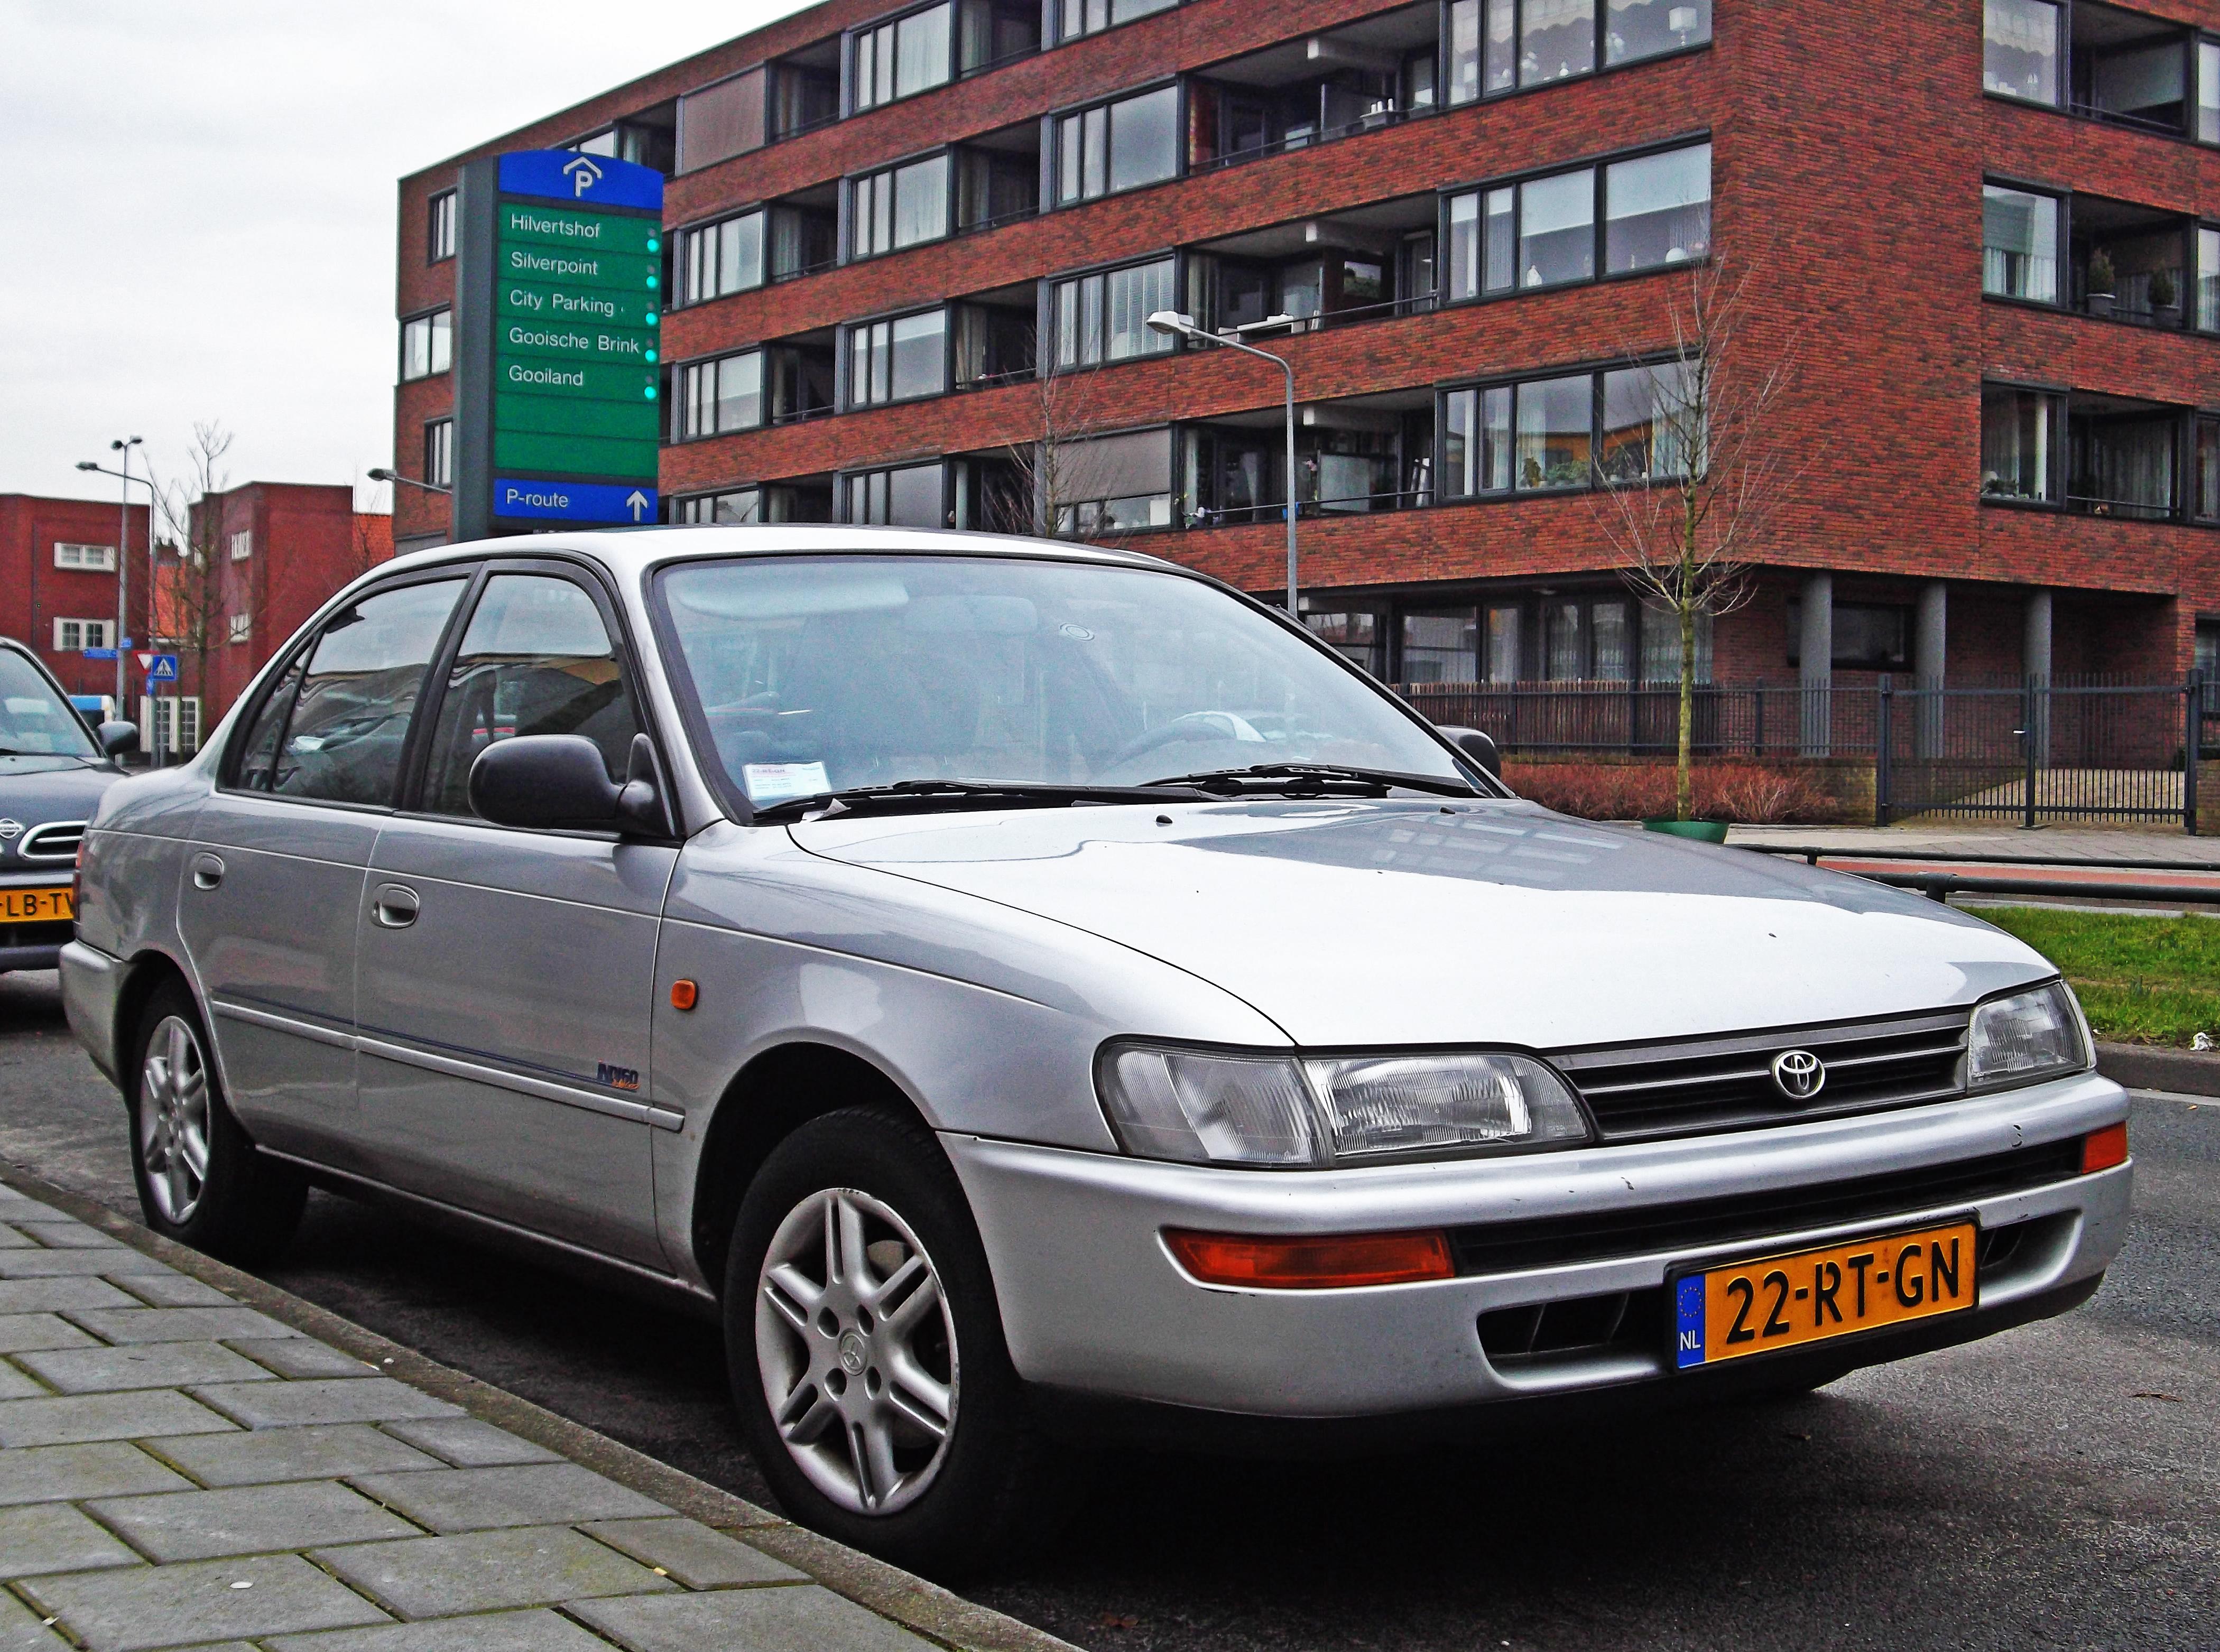 Kekurangan Toyota Corolla 2.0 Perbandingan Harga